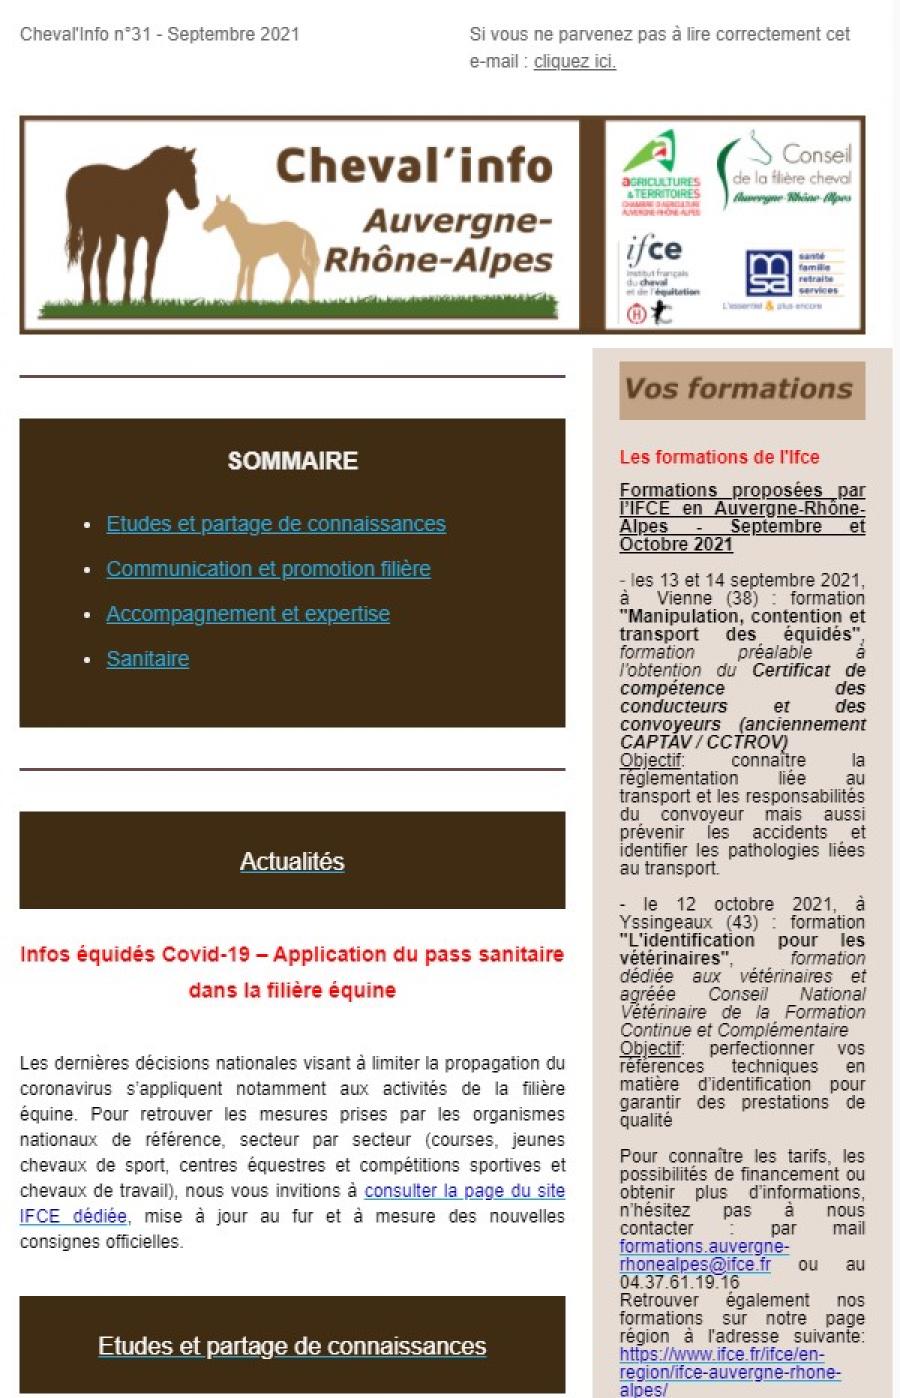 Couv_cheval_info_31.jpg